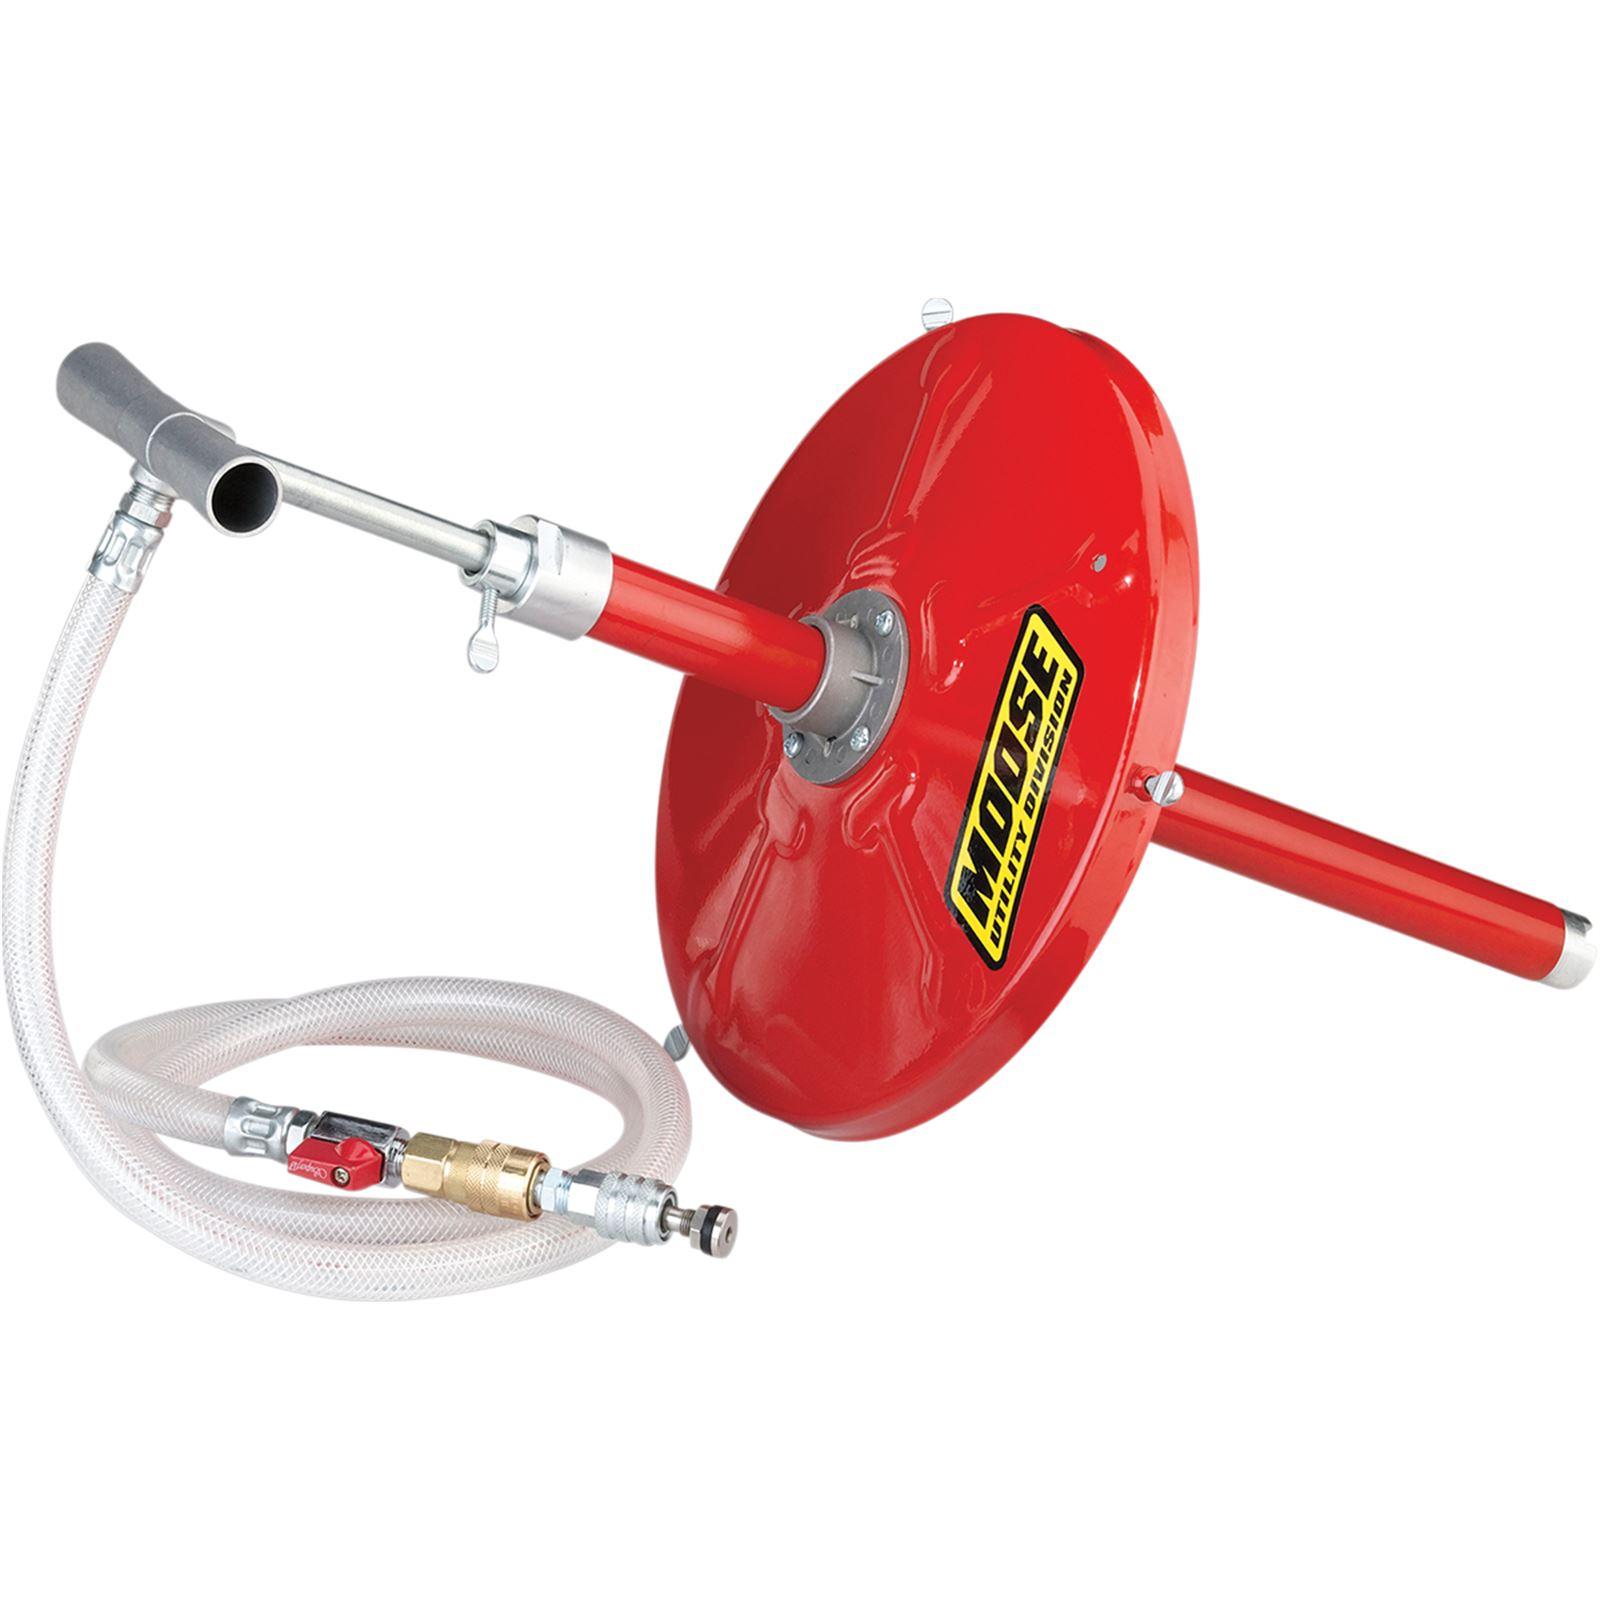 Moose Pump for 5 US Gallon Tire Sealant